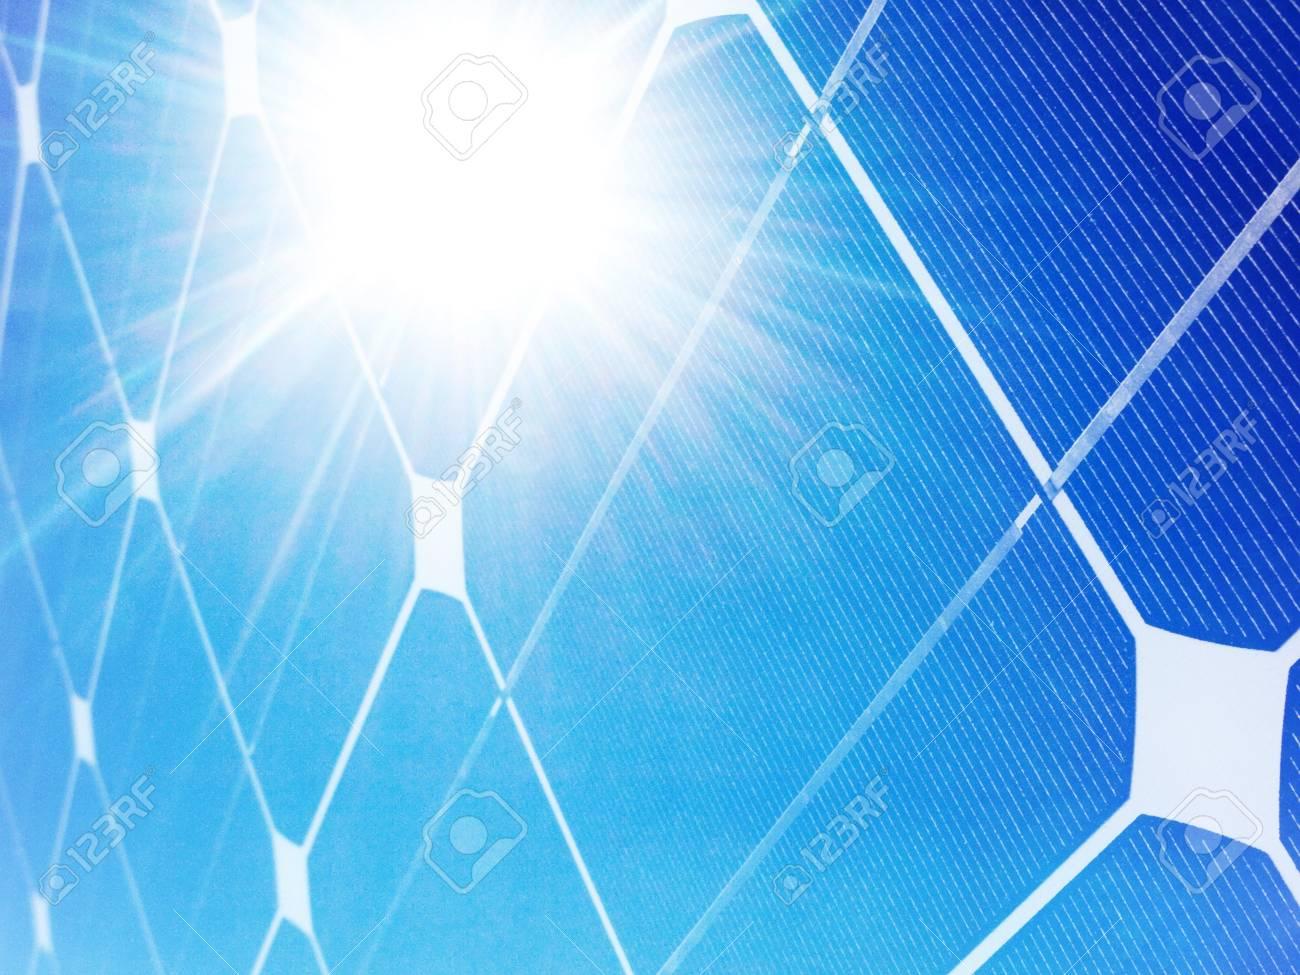 Photovoltaic solar panel against bright sunshine Stock Photo - 7856234